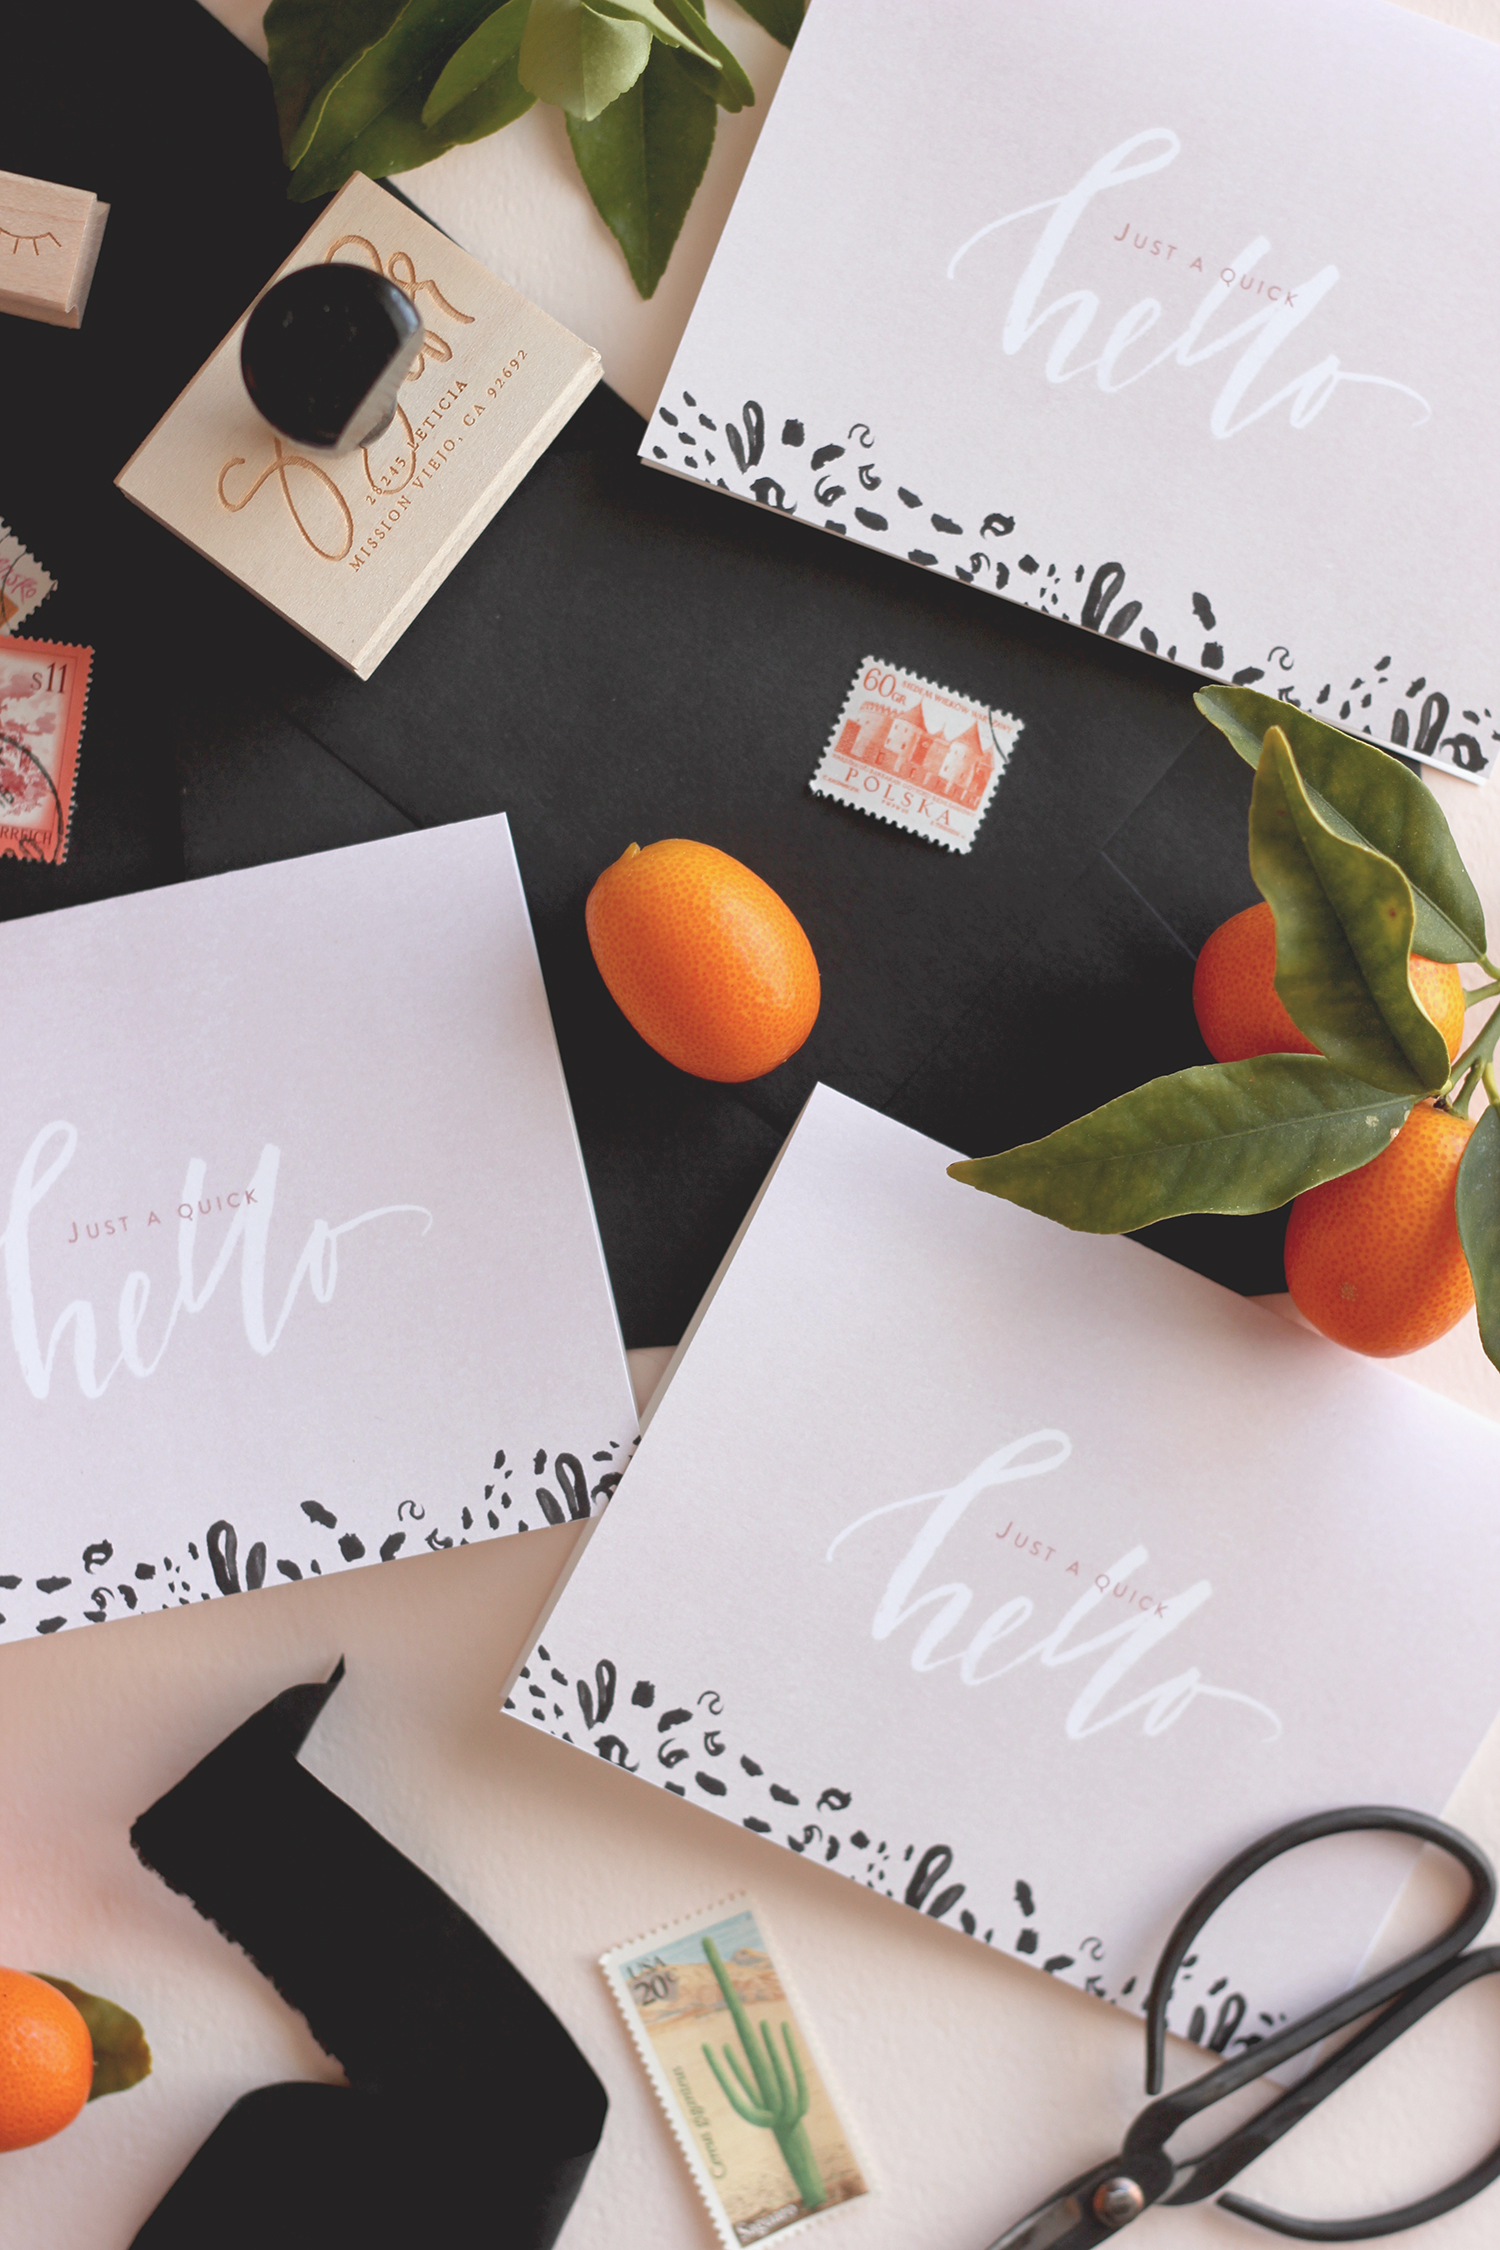 Free printable hello cards | A Fabulous Fete